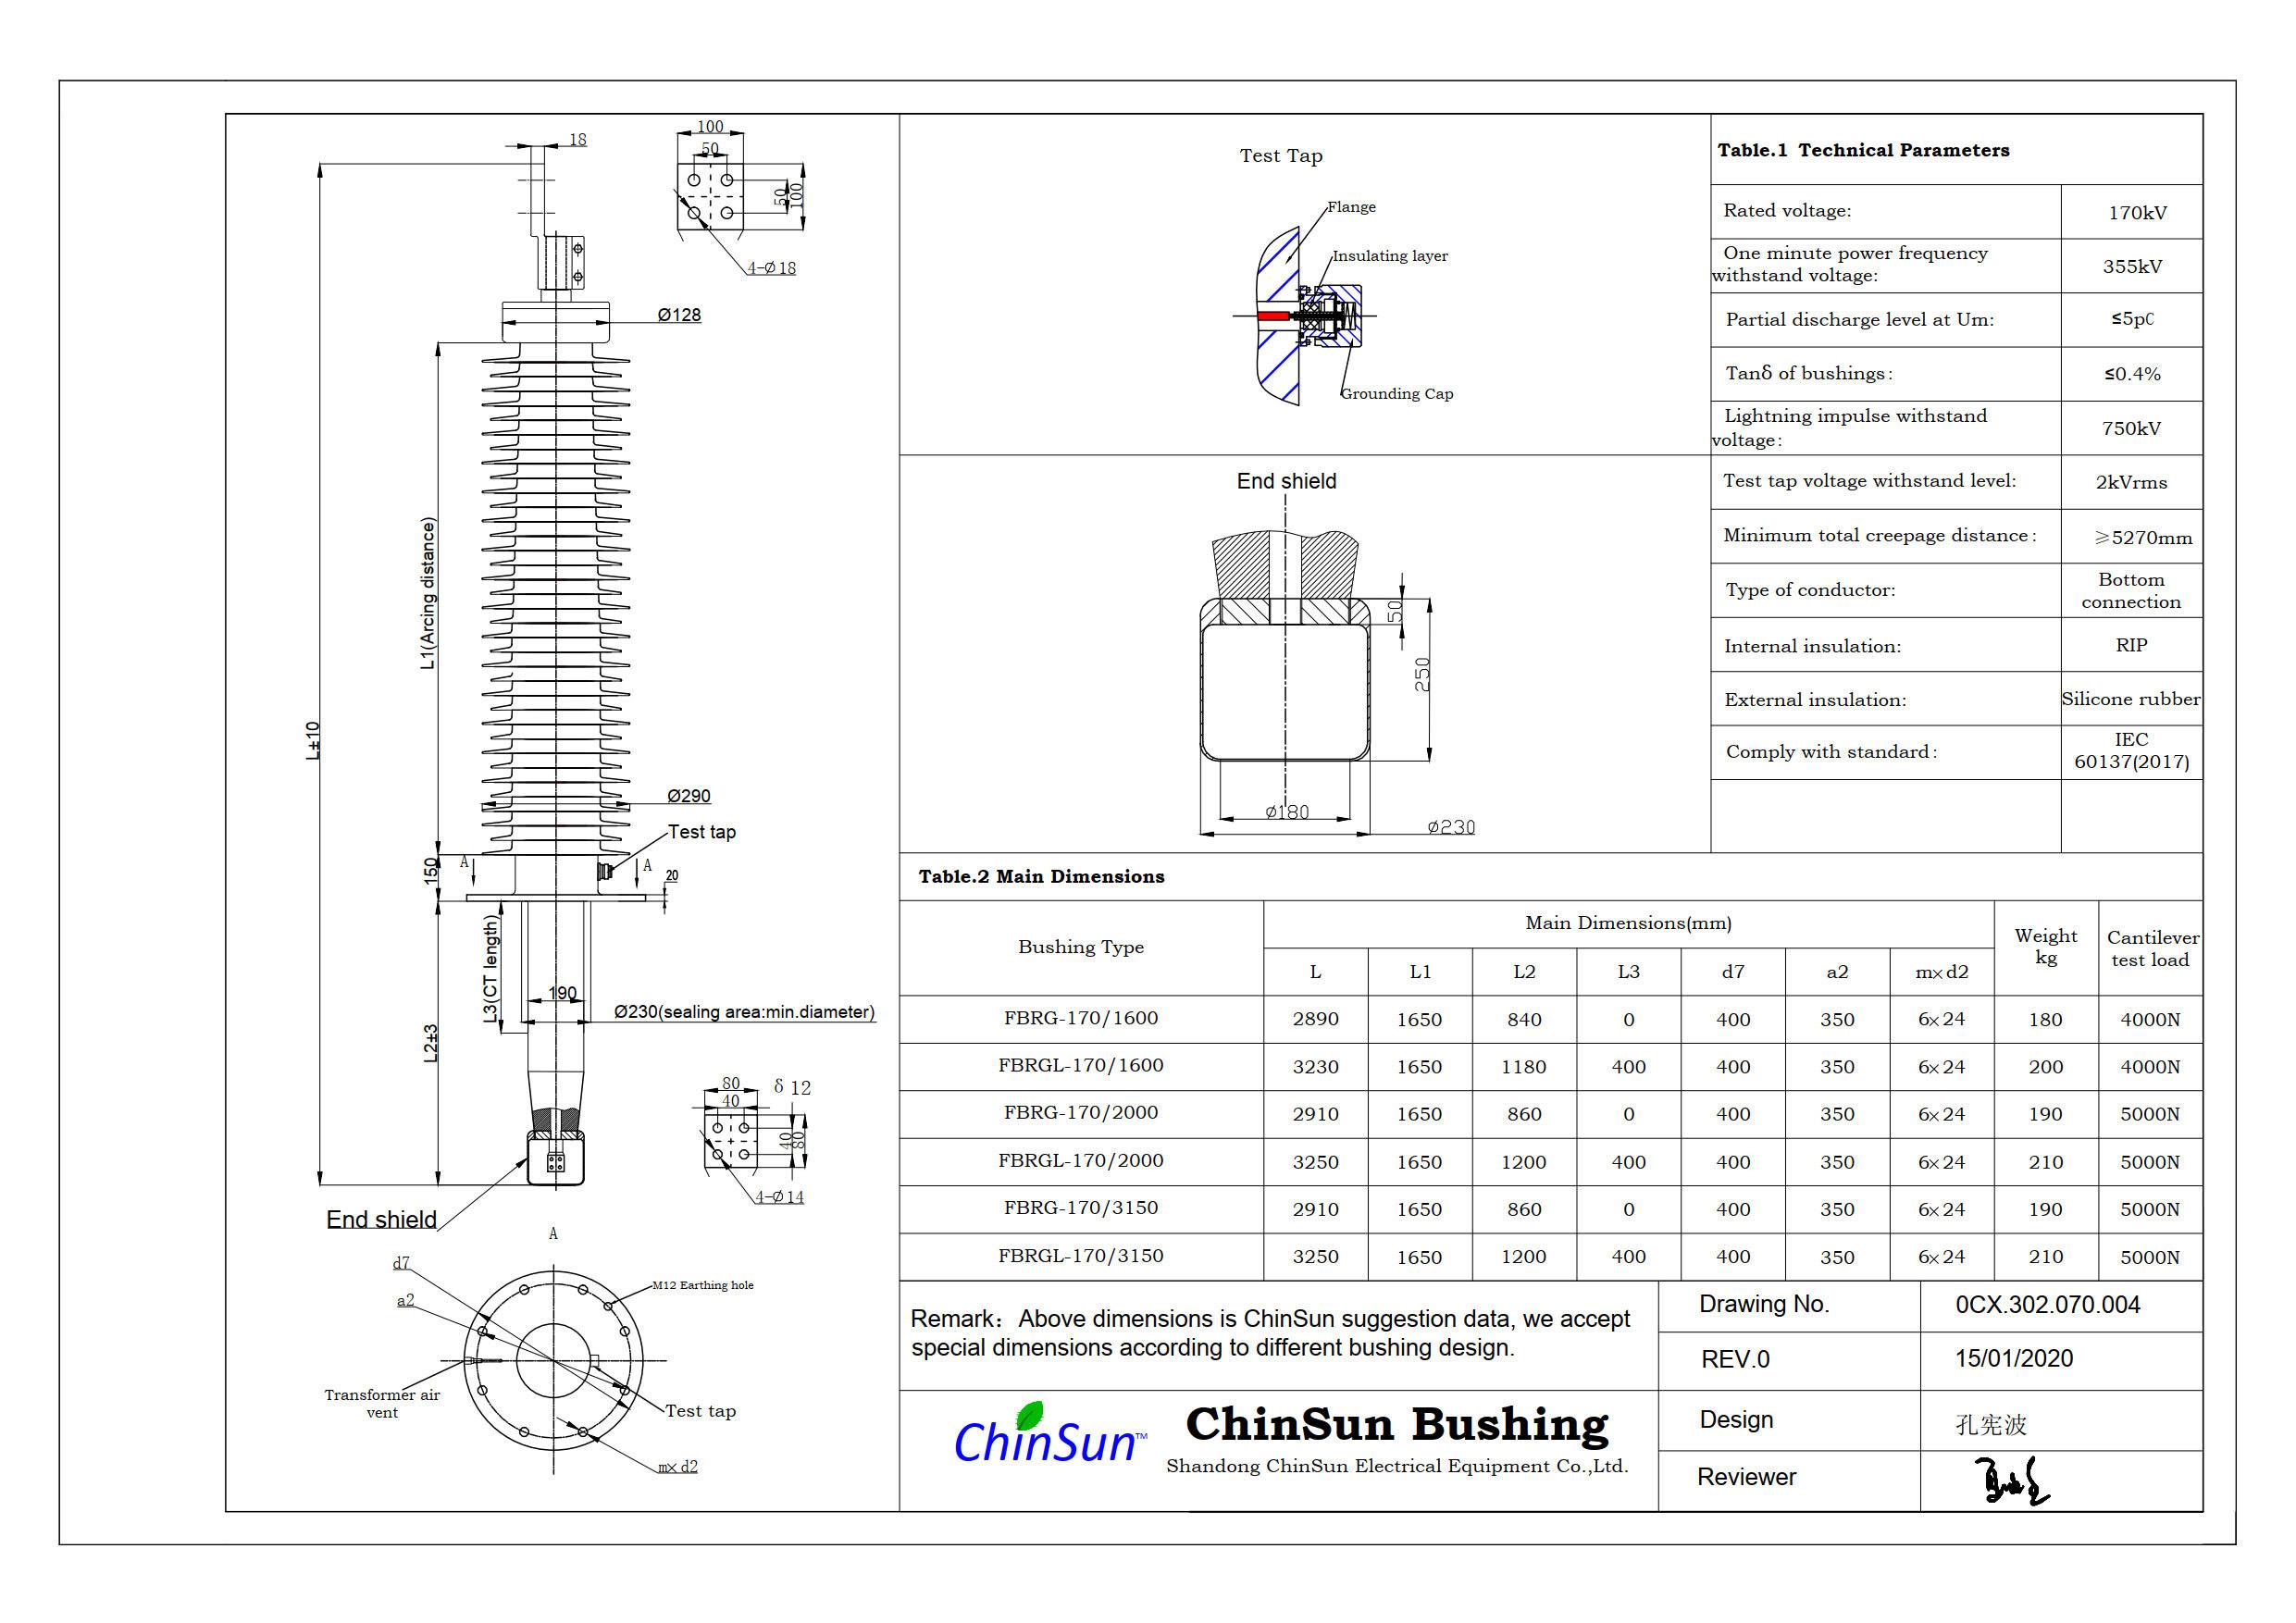 Drawing-transformer bushing-170kV_Silicone rubber-BC-ChinSun